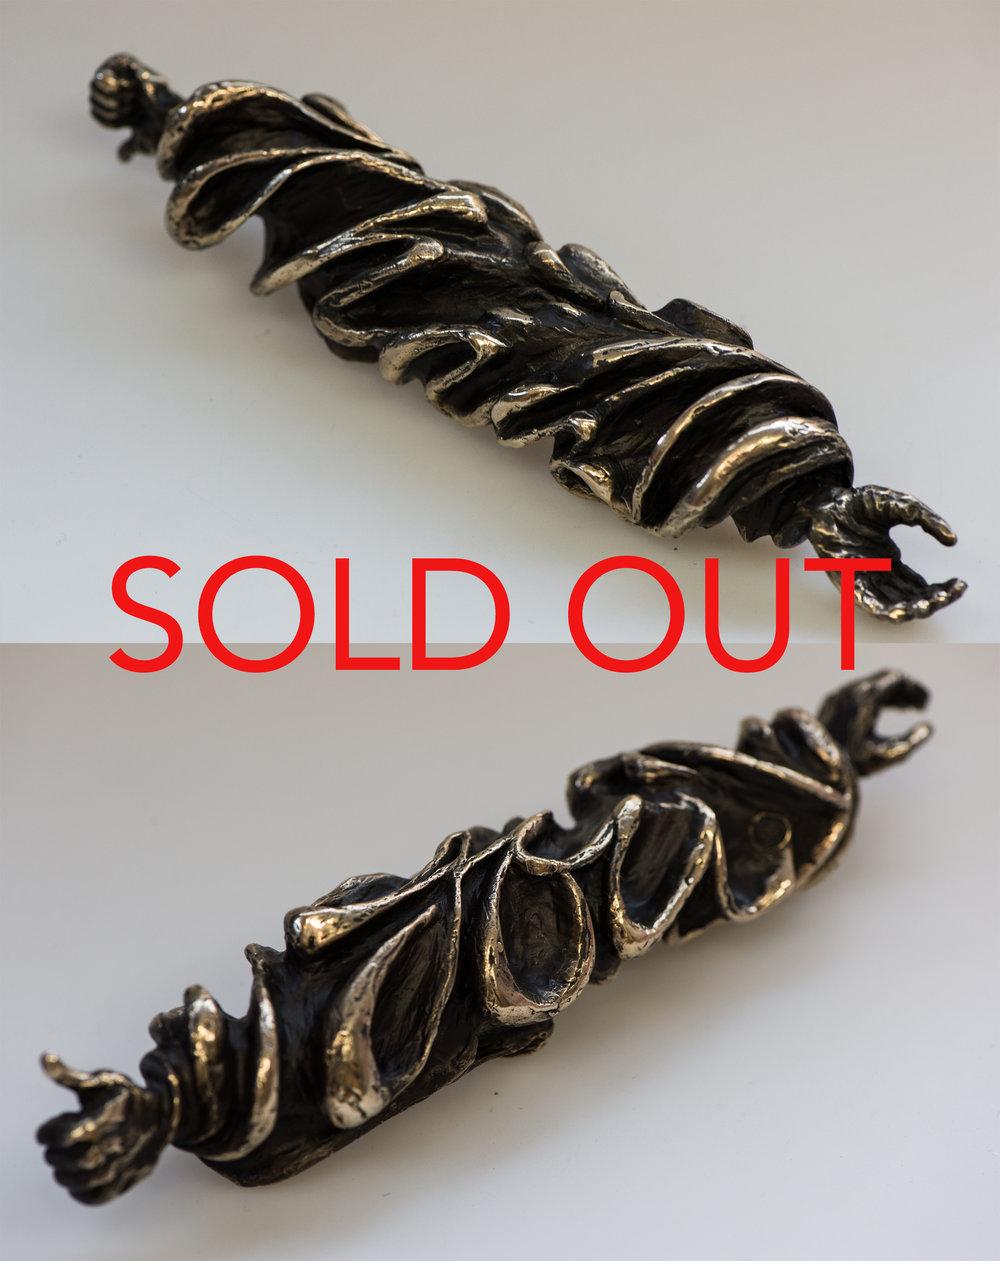 Gratification sold out.jpg